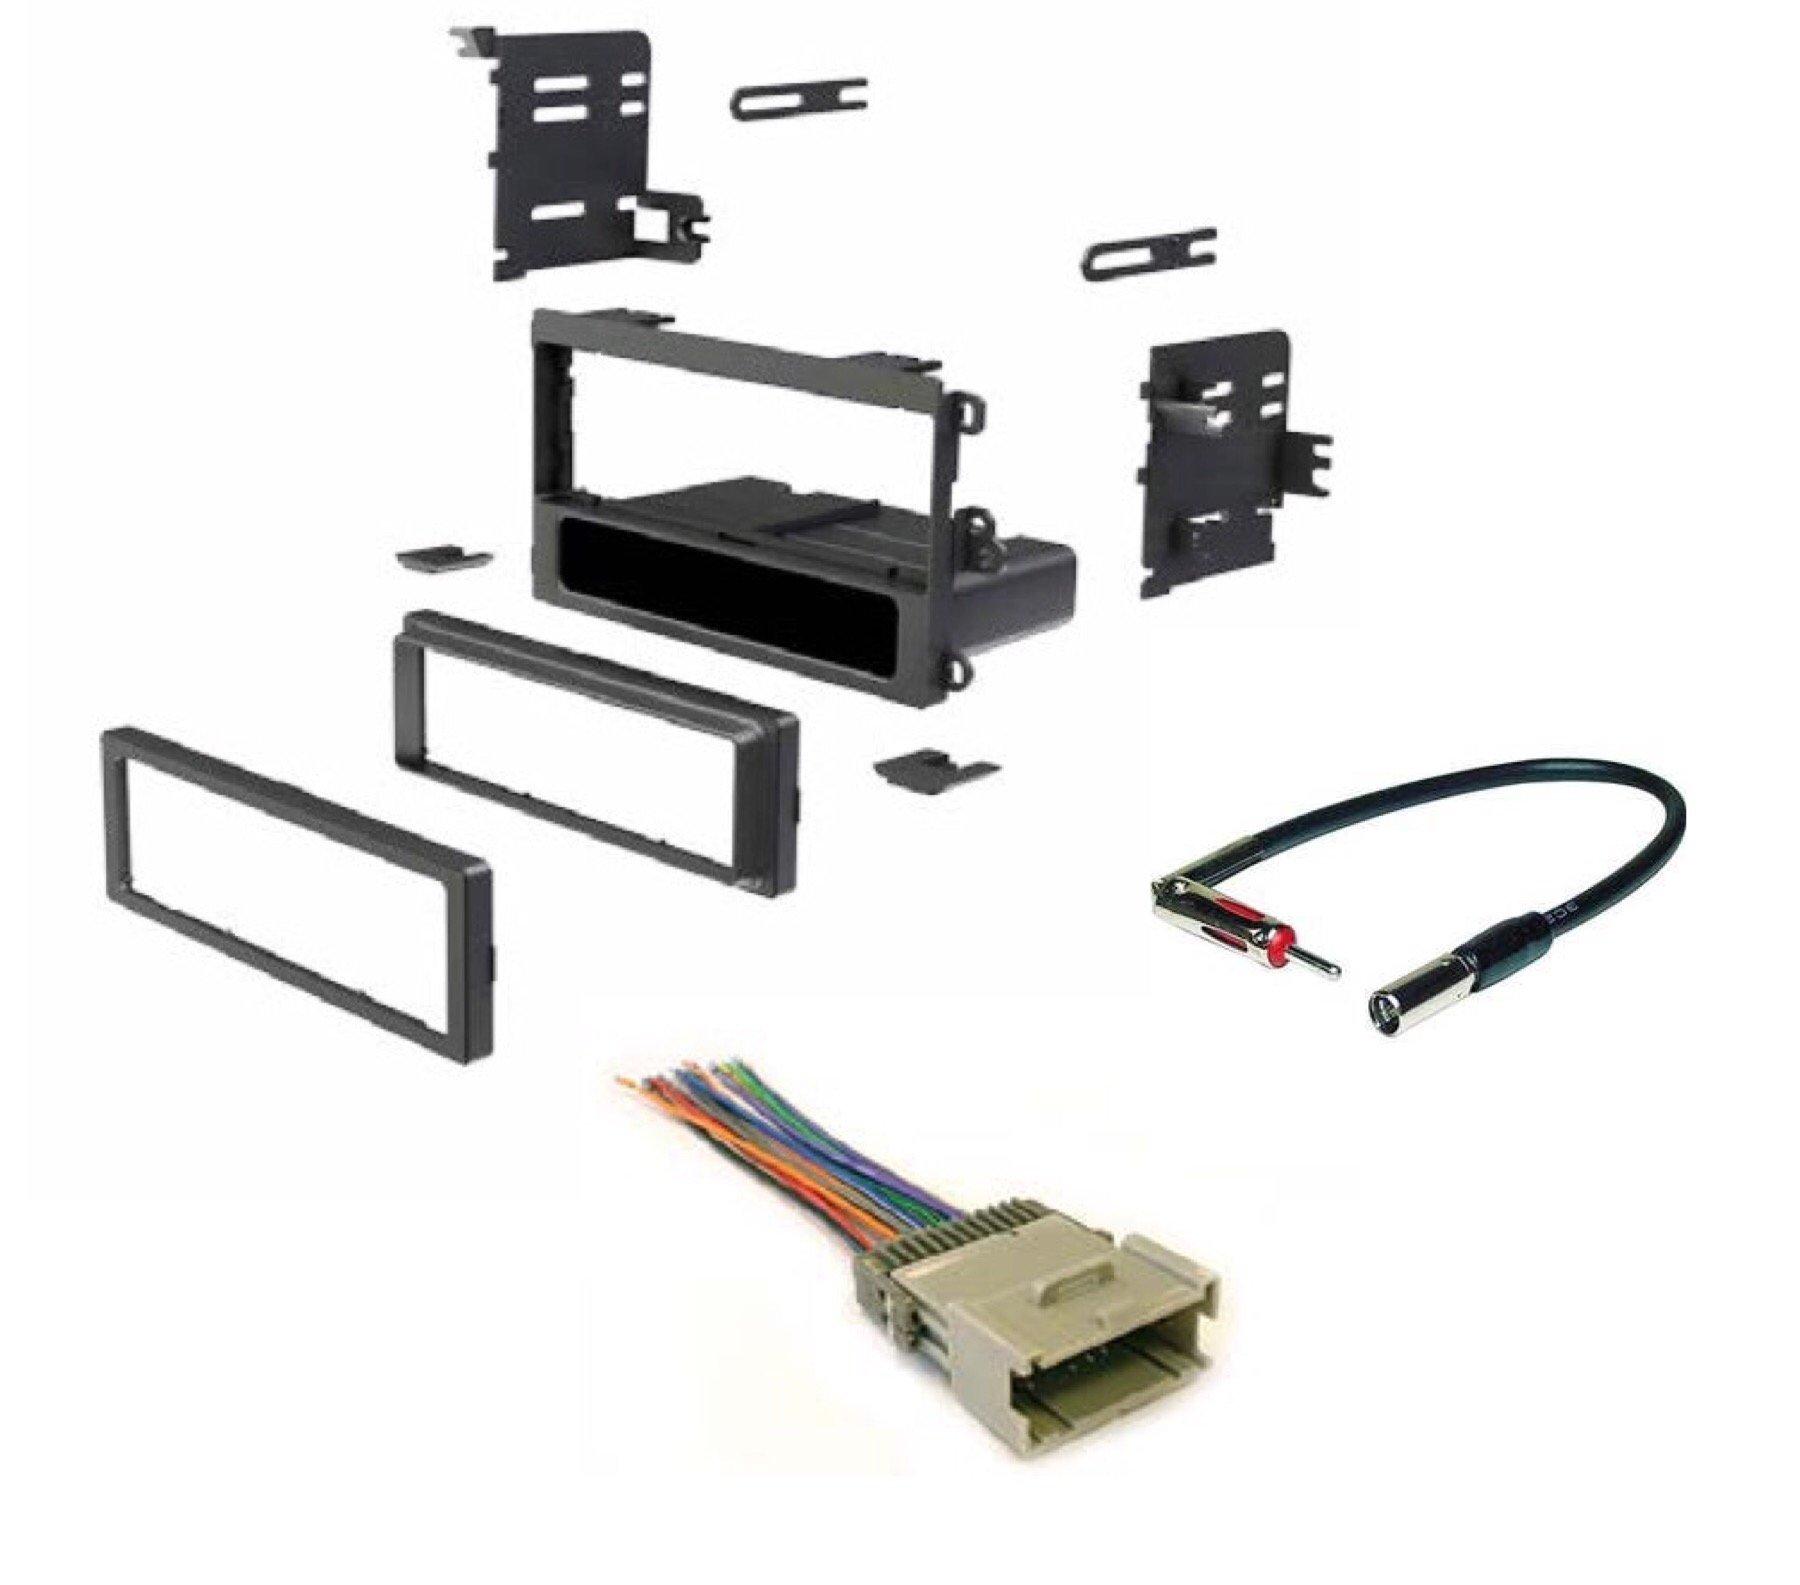 ASC Single Din Car Radio Dash kit, Wire Harness, and Antenna Adapter for Chevrolet: 03-05 Blazer/S10, 01-02 Express, 00-01 Metro, 98-04 Tracker; GMC : 01-02 Savana, 03-04 Sonoma; 99-04 Suzuki Vitara